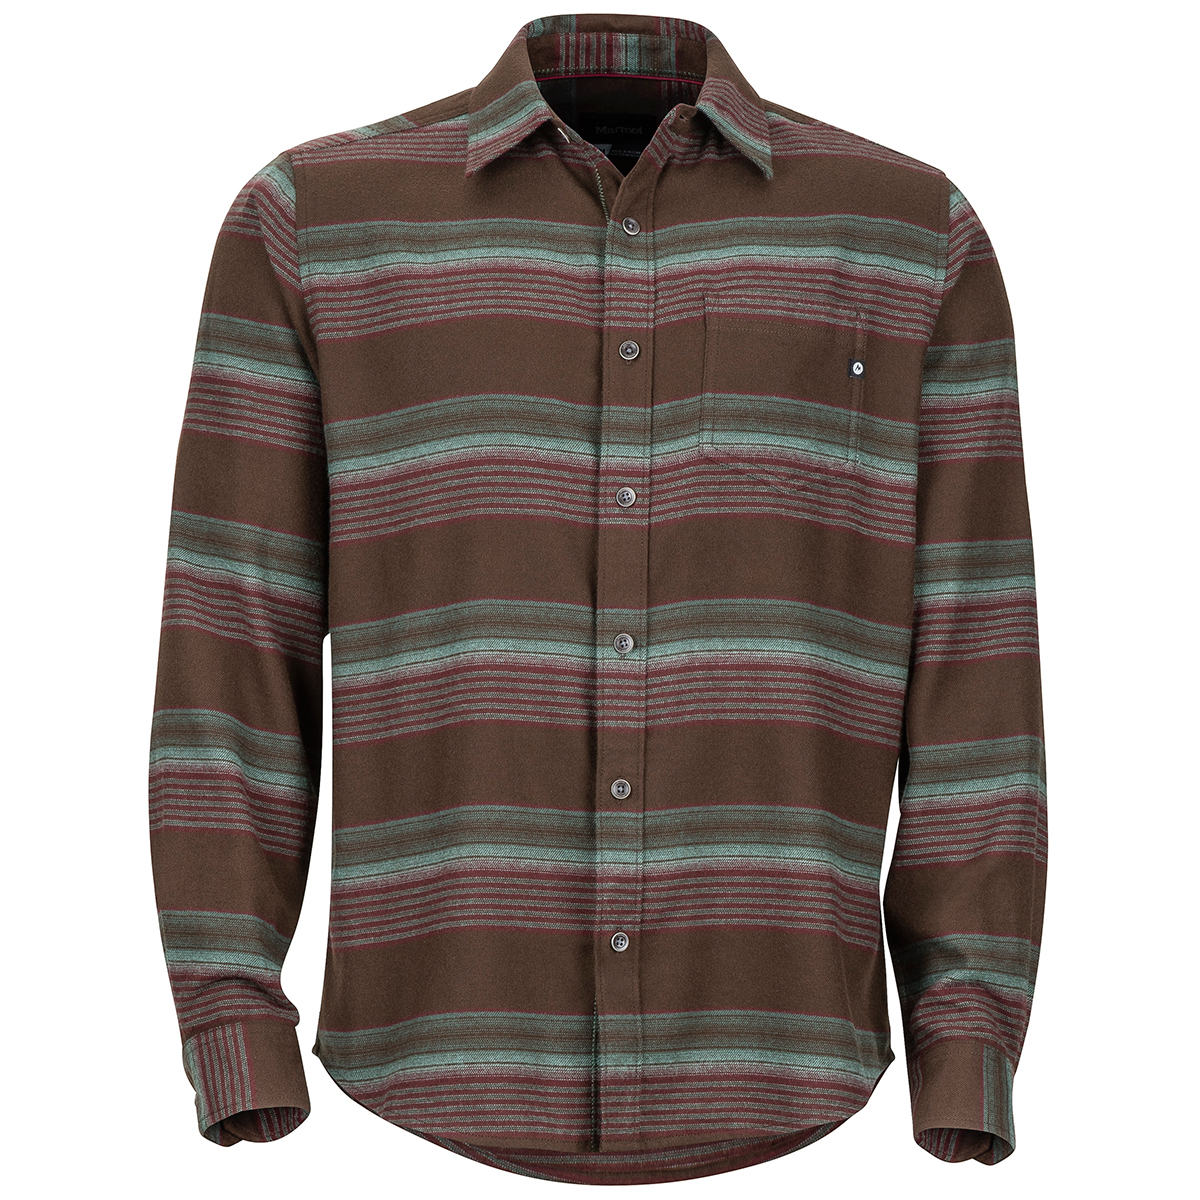 Marmot Men's Enfield Midweight Flannel Long-Sleeve Shirt - Brown, M